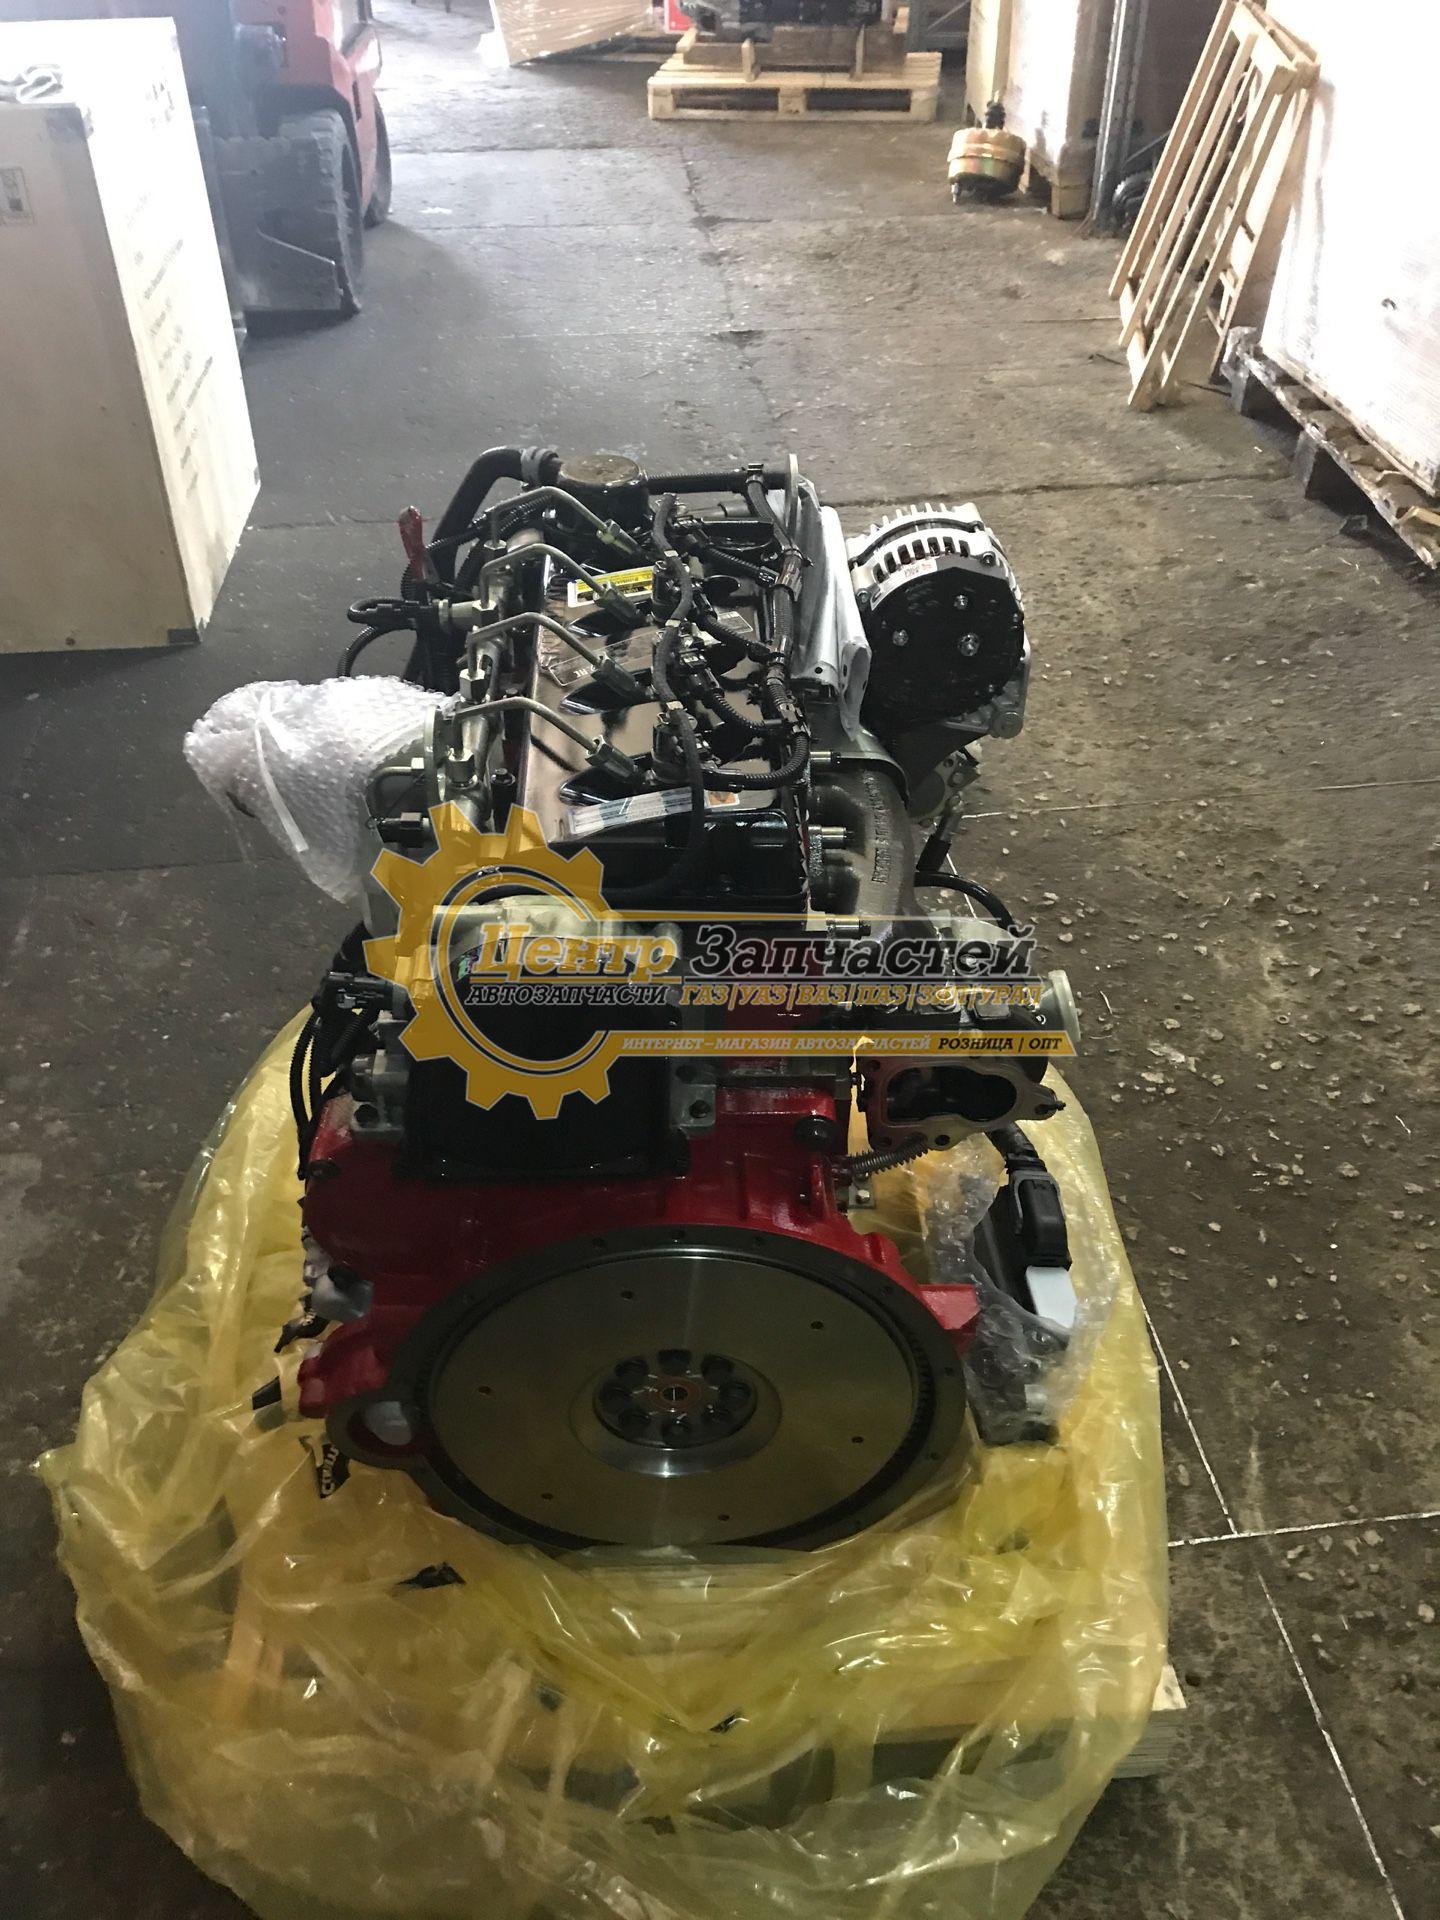 Двигатель Cummins ISF2.8 евро 3, евро 4 на газель Бизнес .Артикул ISF2.8S4129P-014 ISF2.8S3129Т-003